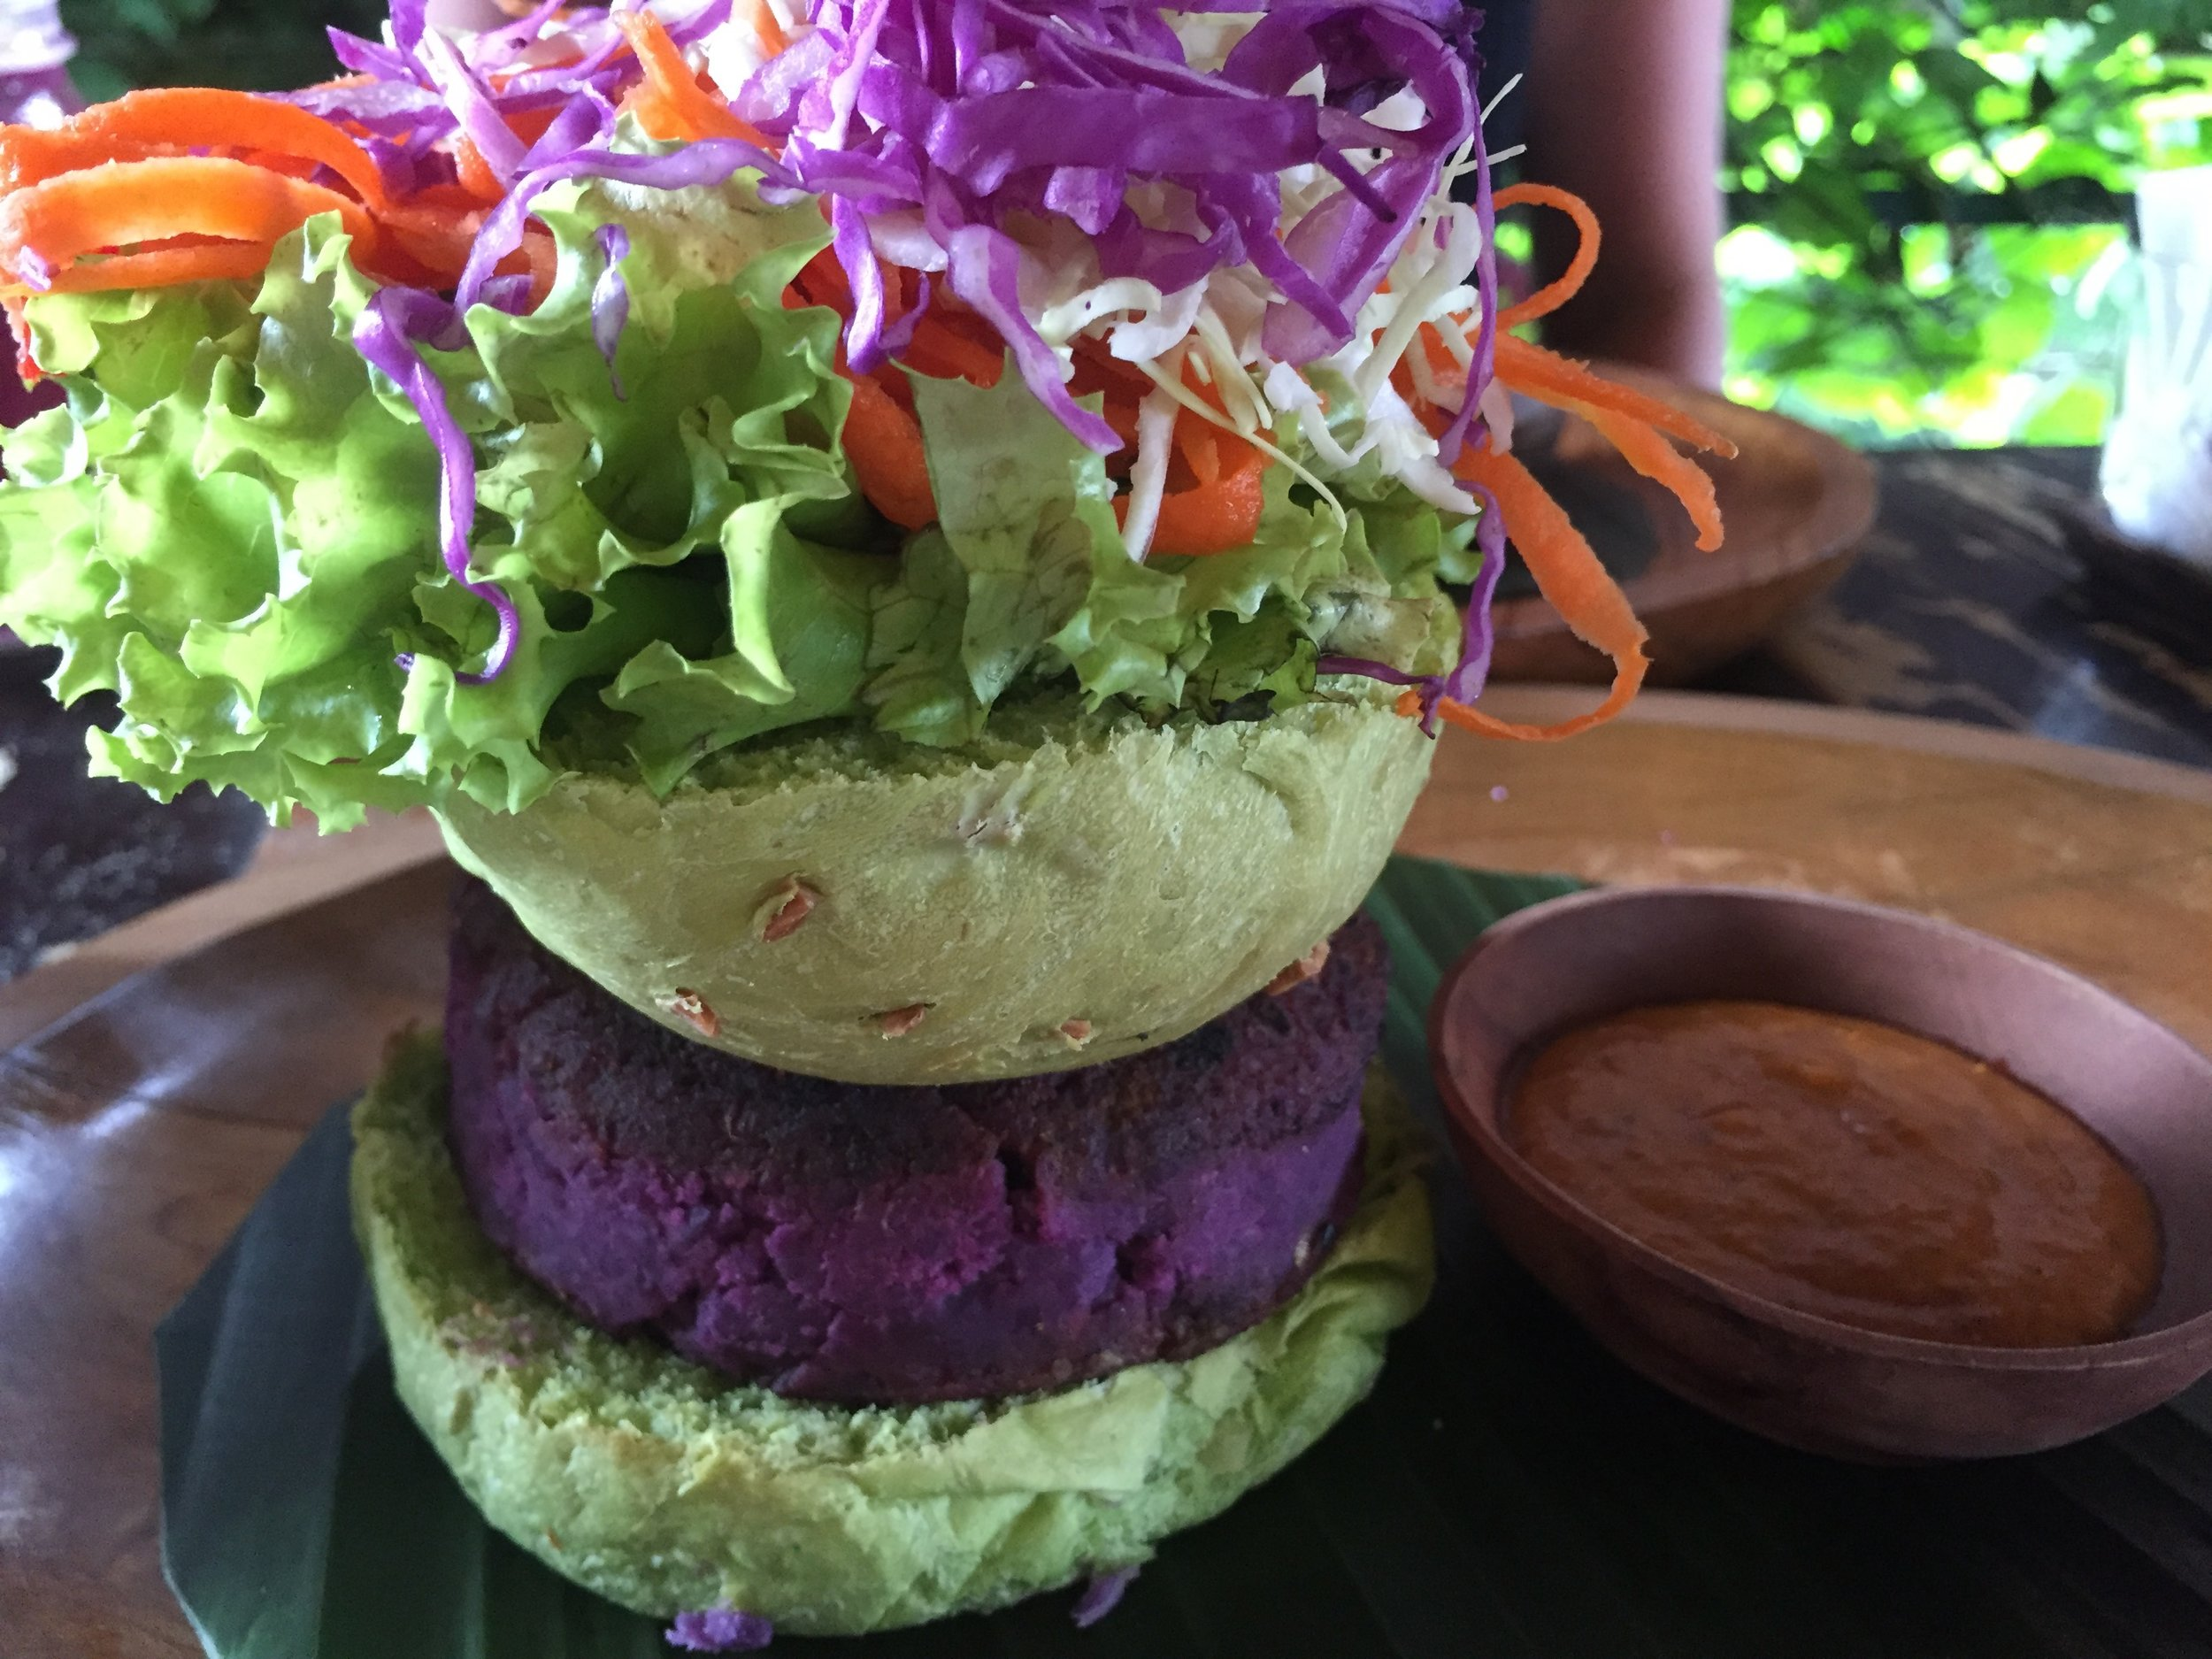 OM Burger No.432, Jl. Labuansait, Pecatu, Kuta Sel., Kabupaten Badung, Bali 80361, Indonesia